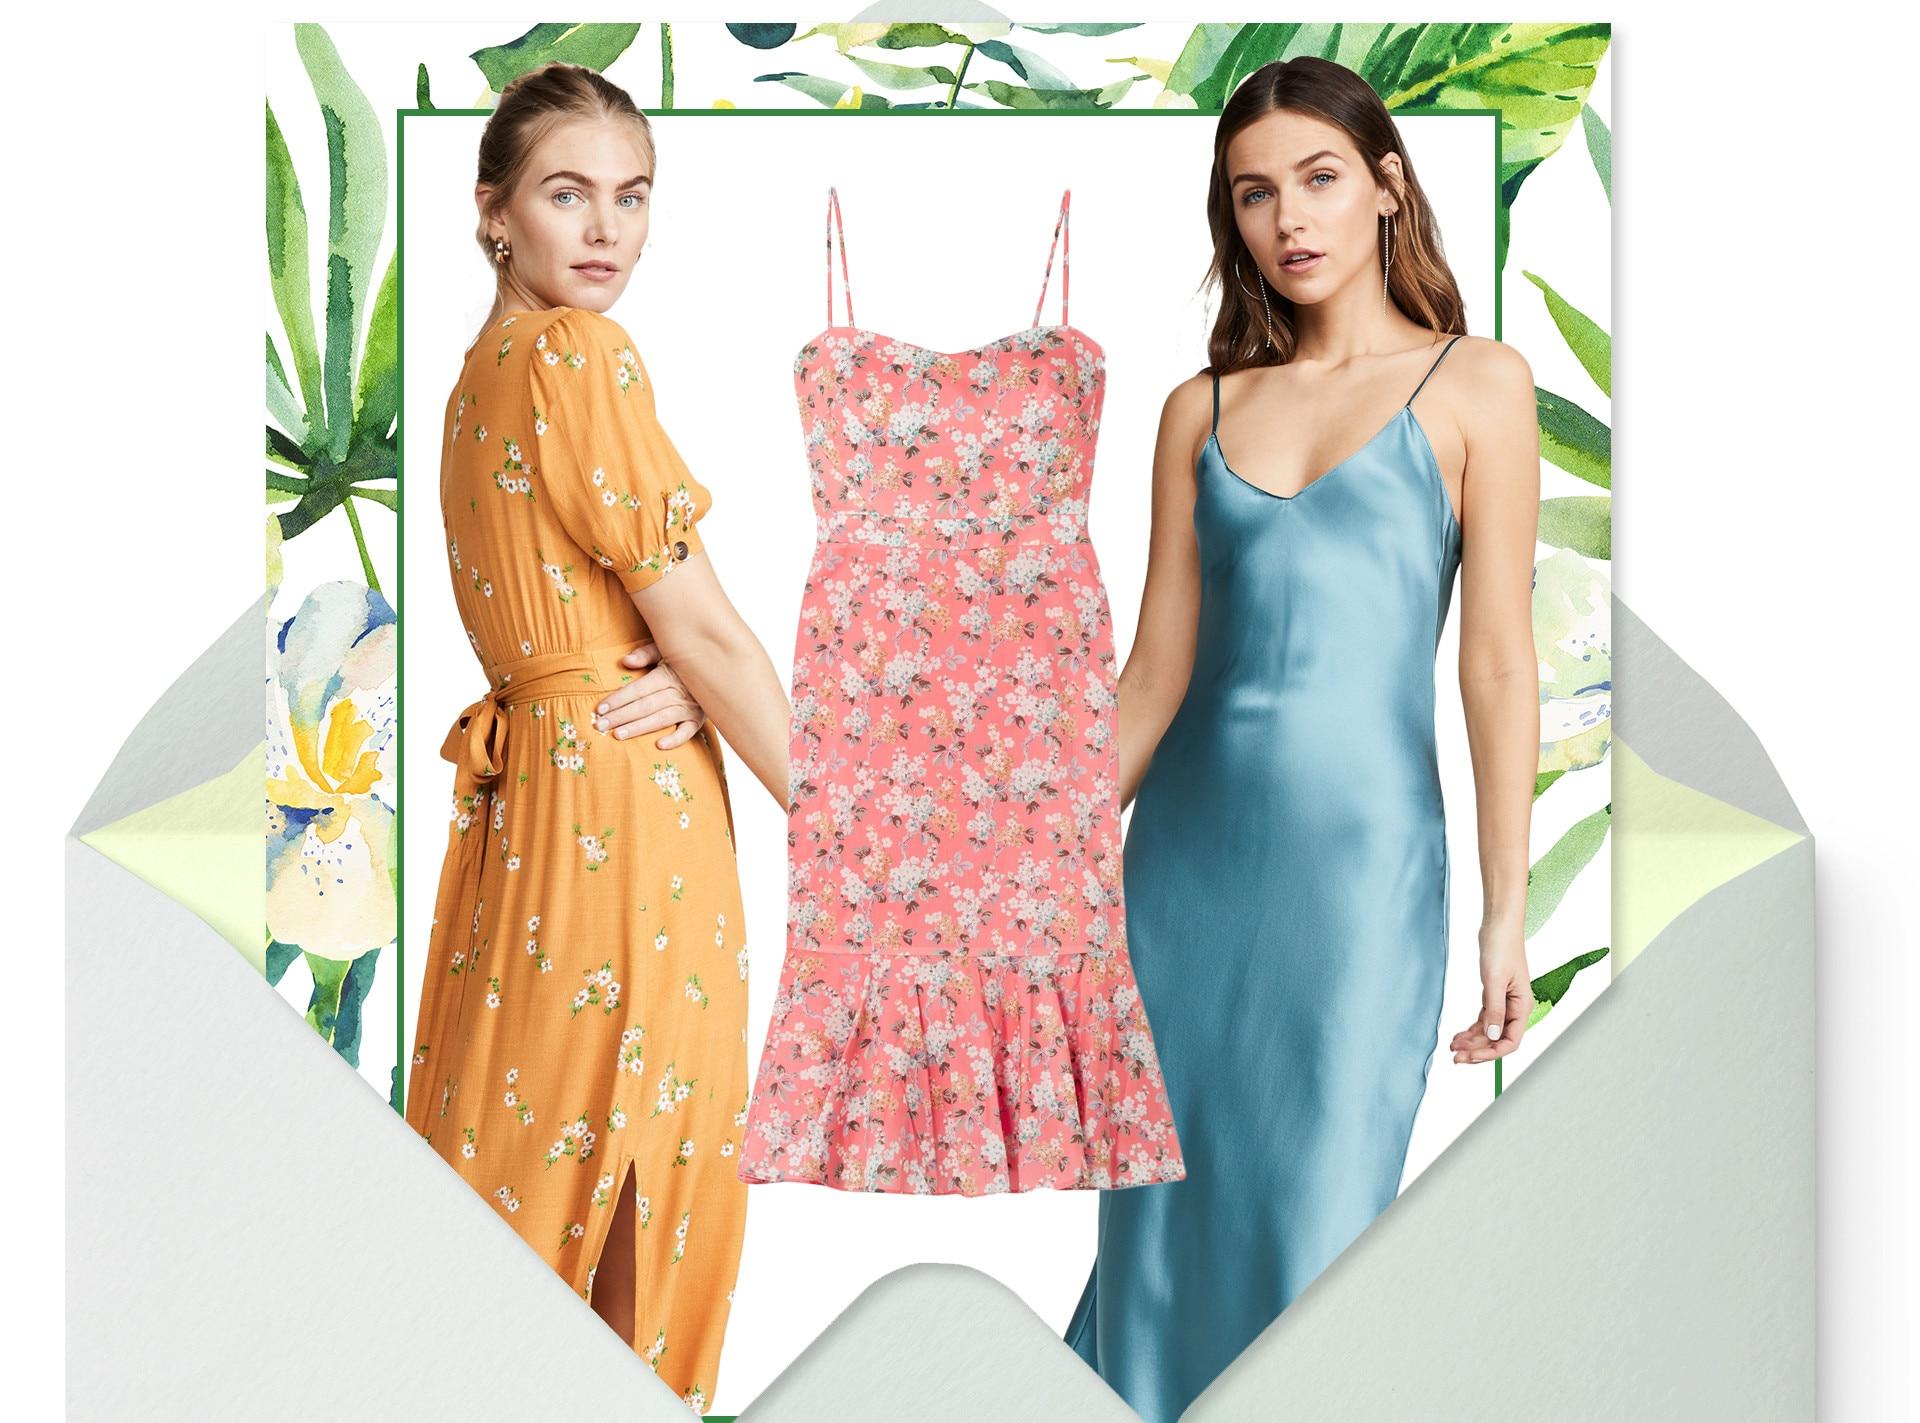 Summer Wedding Guest Dresses You'll Wear Forever | E! News